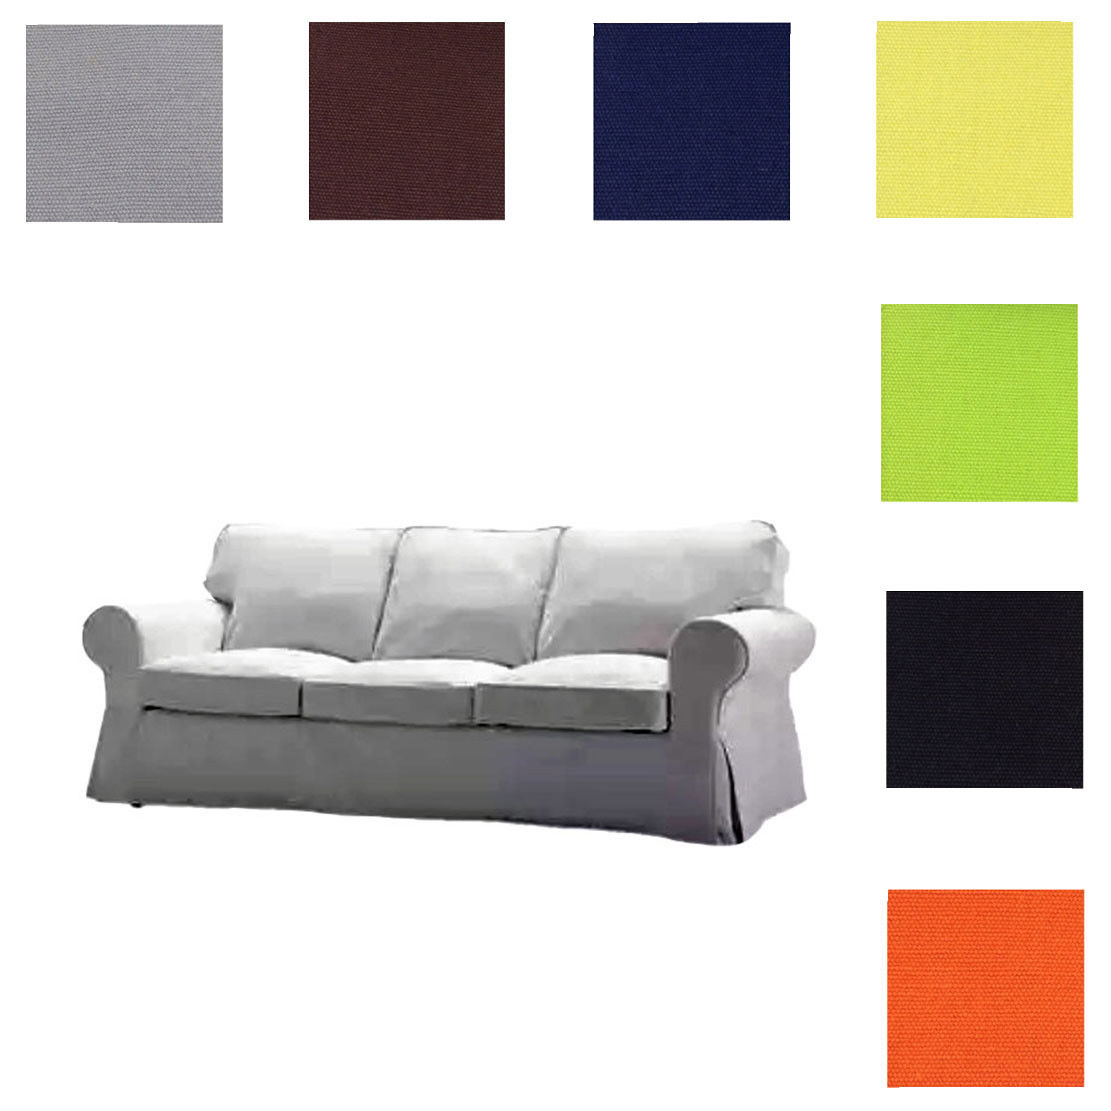 Full Size of Fits Ikea Ektorp Three Seat Sofa Cover Furniture Replace Slipcover 3 2 1 Sitzer Chesterfield Günstig Antikes Inhofer Big Grau Halbrundes Garnitur Teilig Sofa Ektorp Sofa